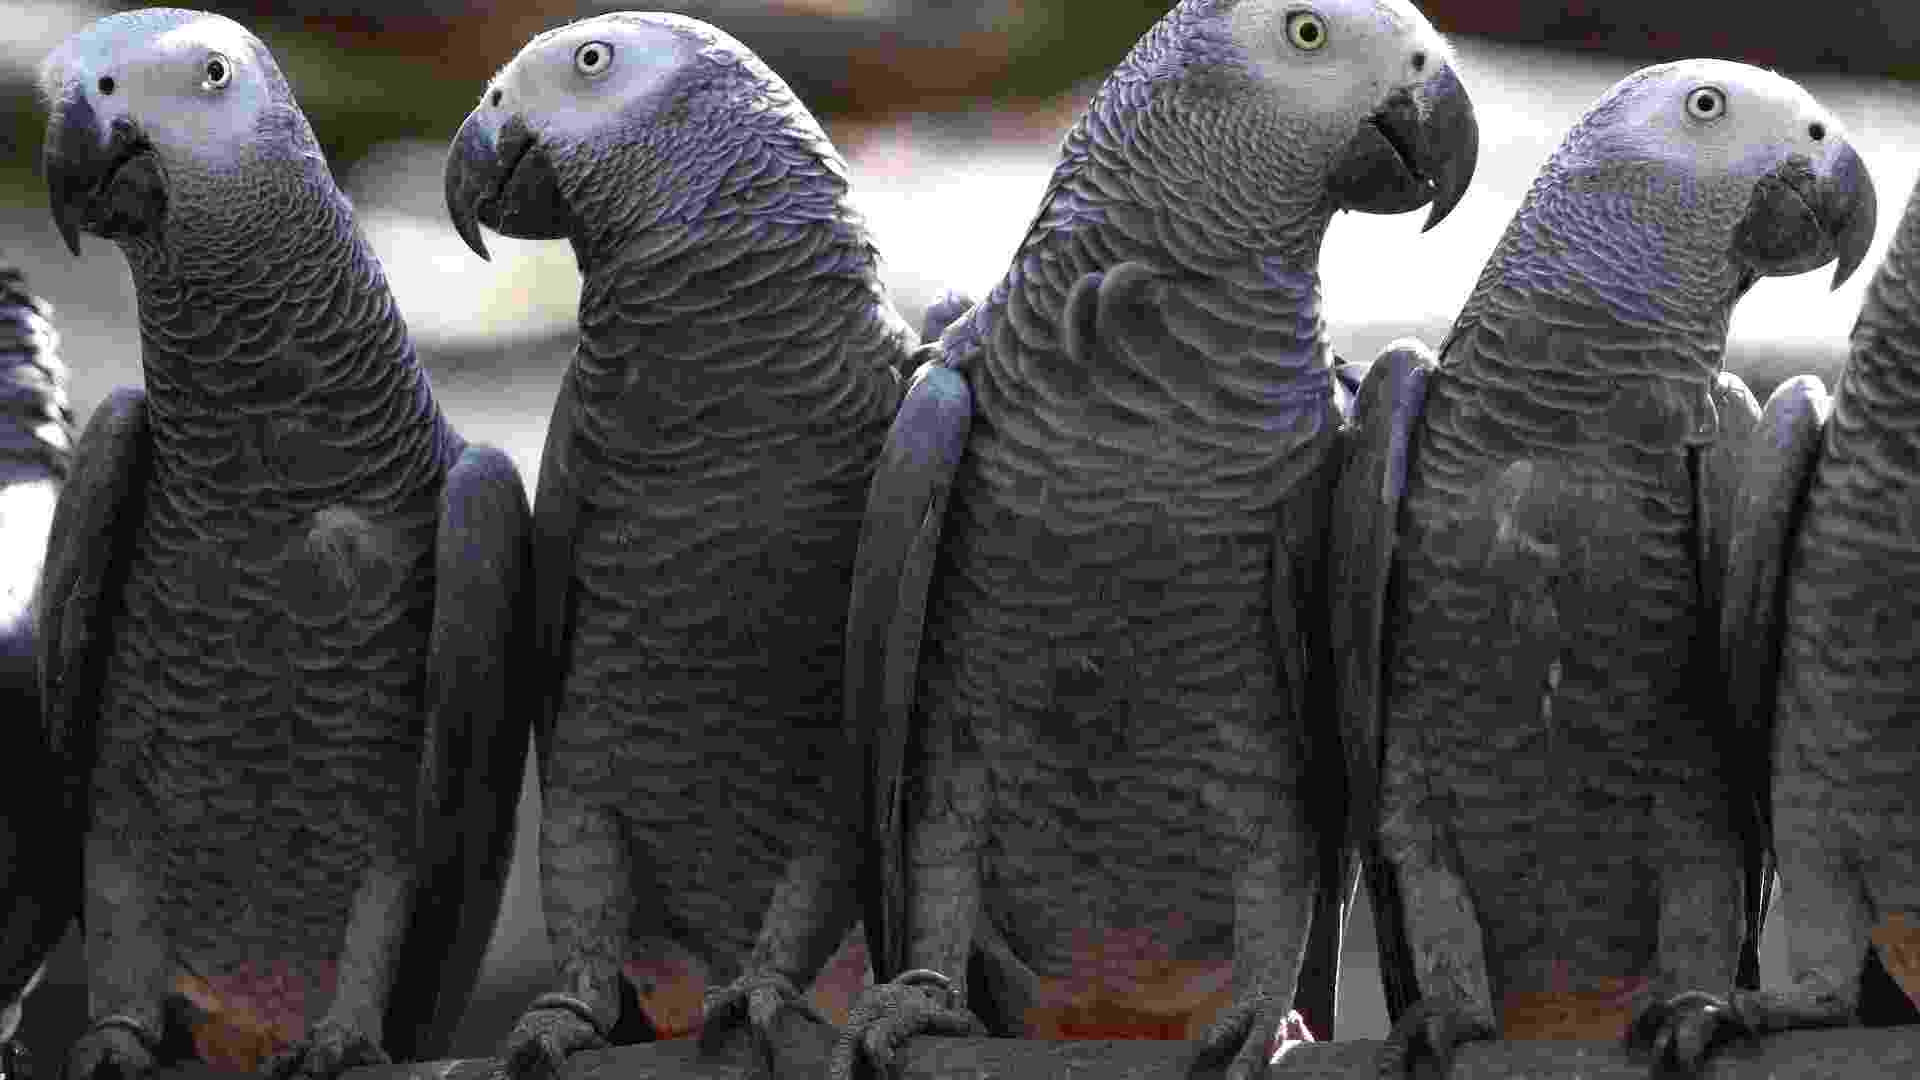 Papagaios cinzentos - Reuters/Edward Echwalu